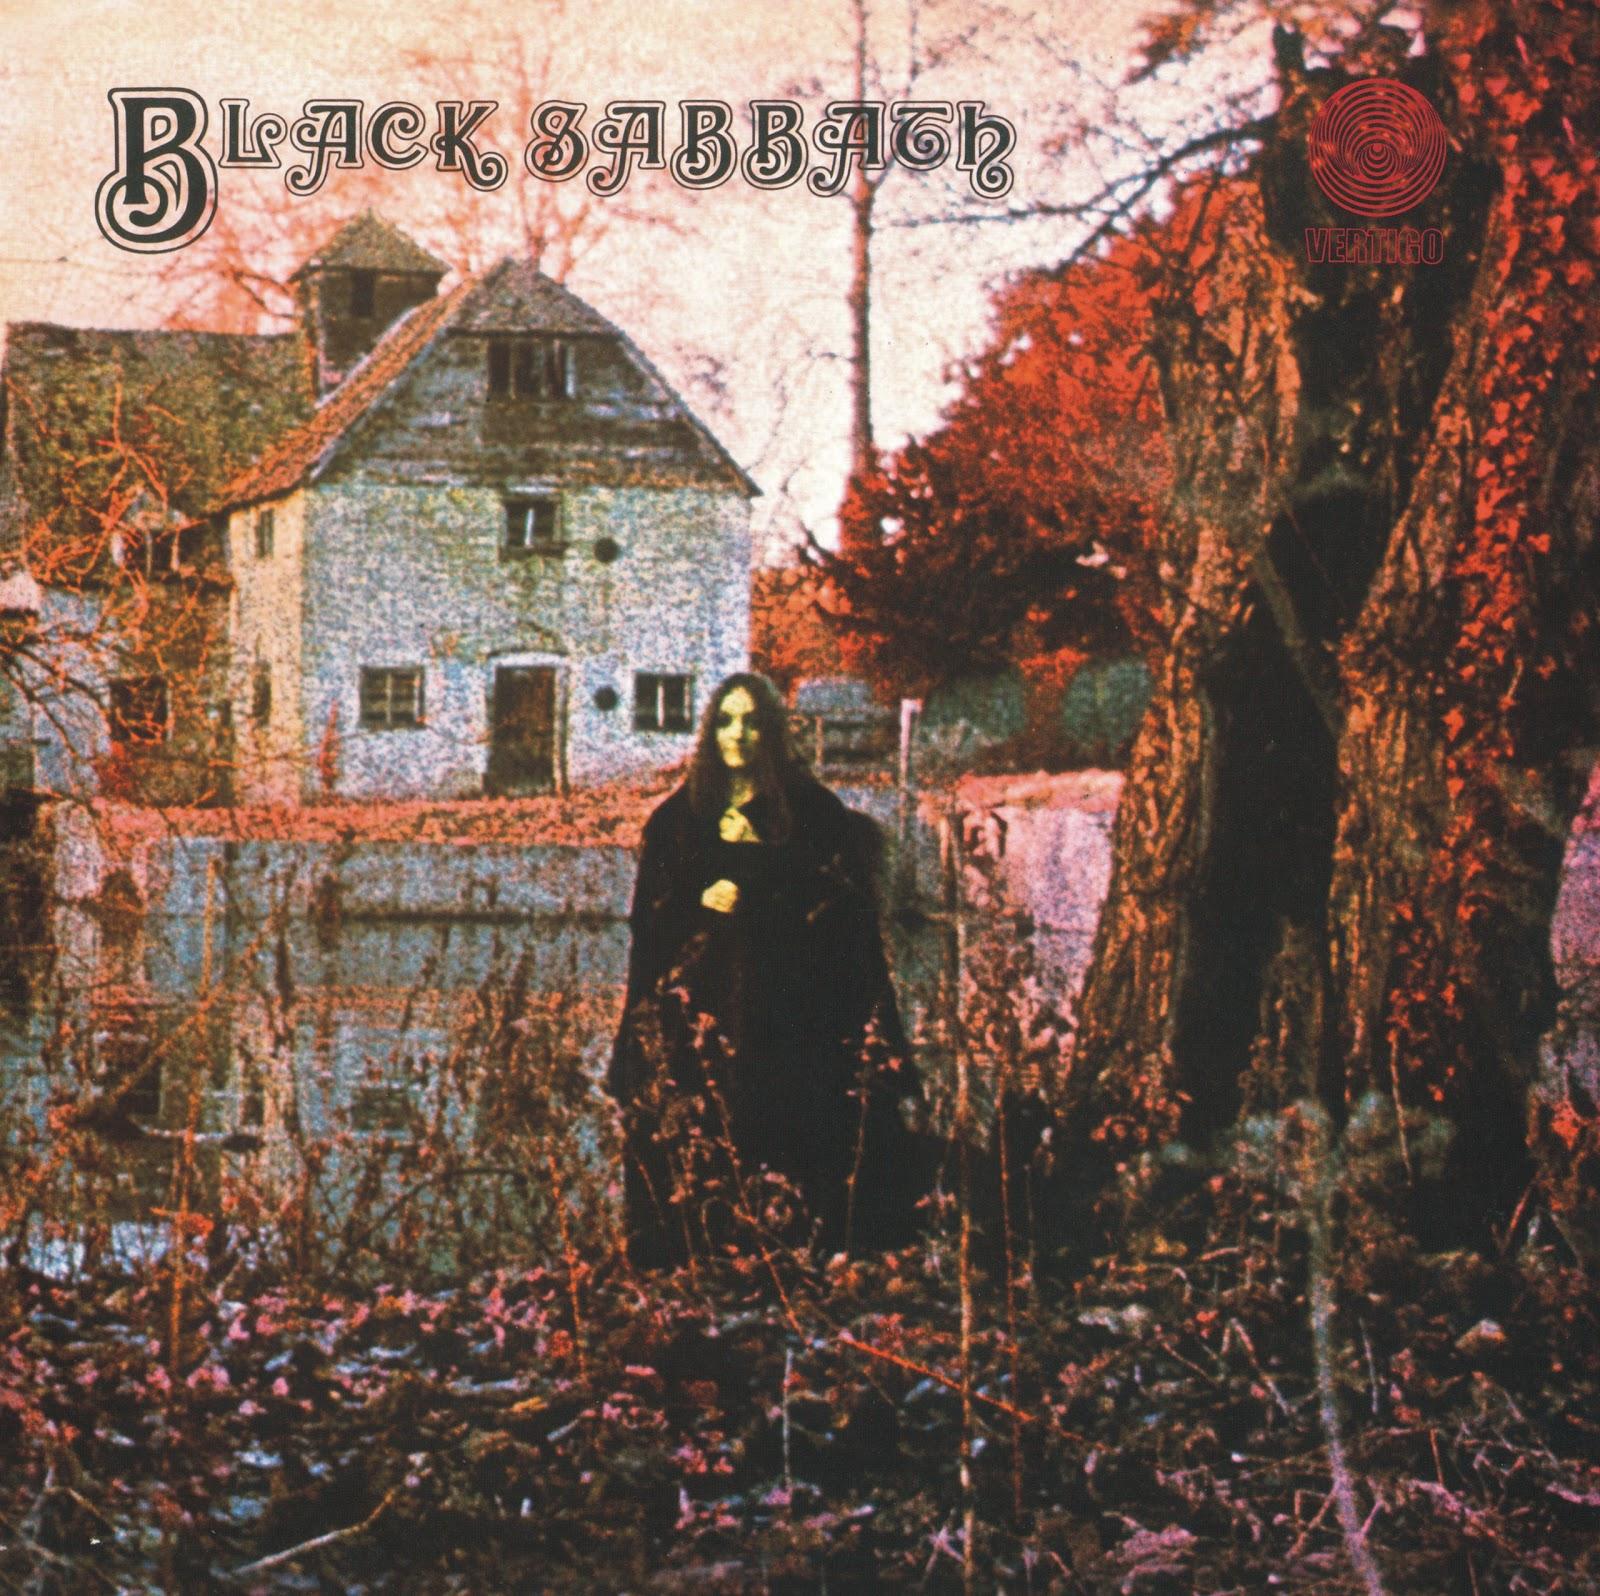 Sabbath70rockarchive Black Sabbath 1970 Black Sabbath